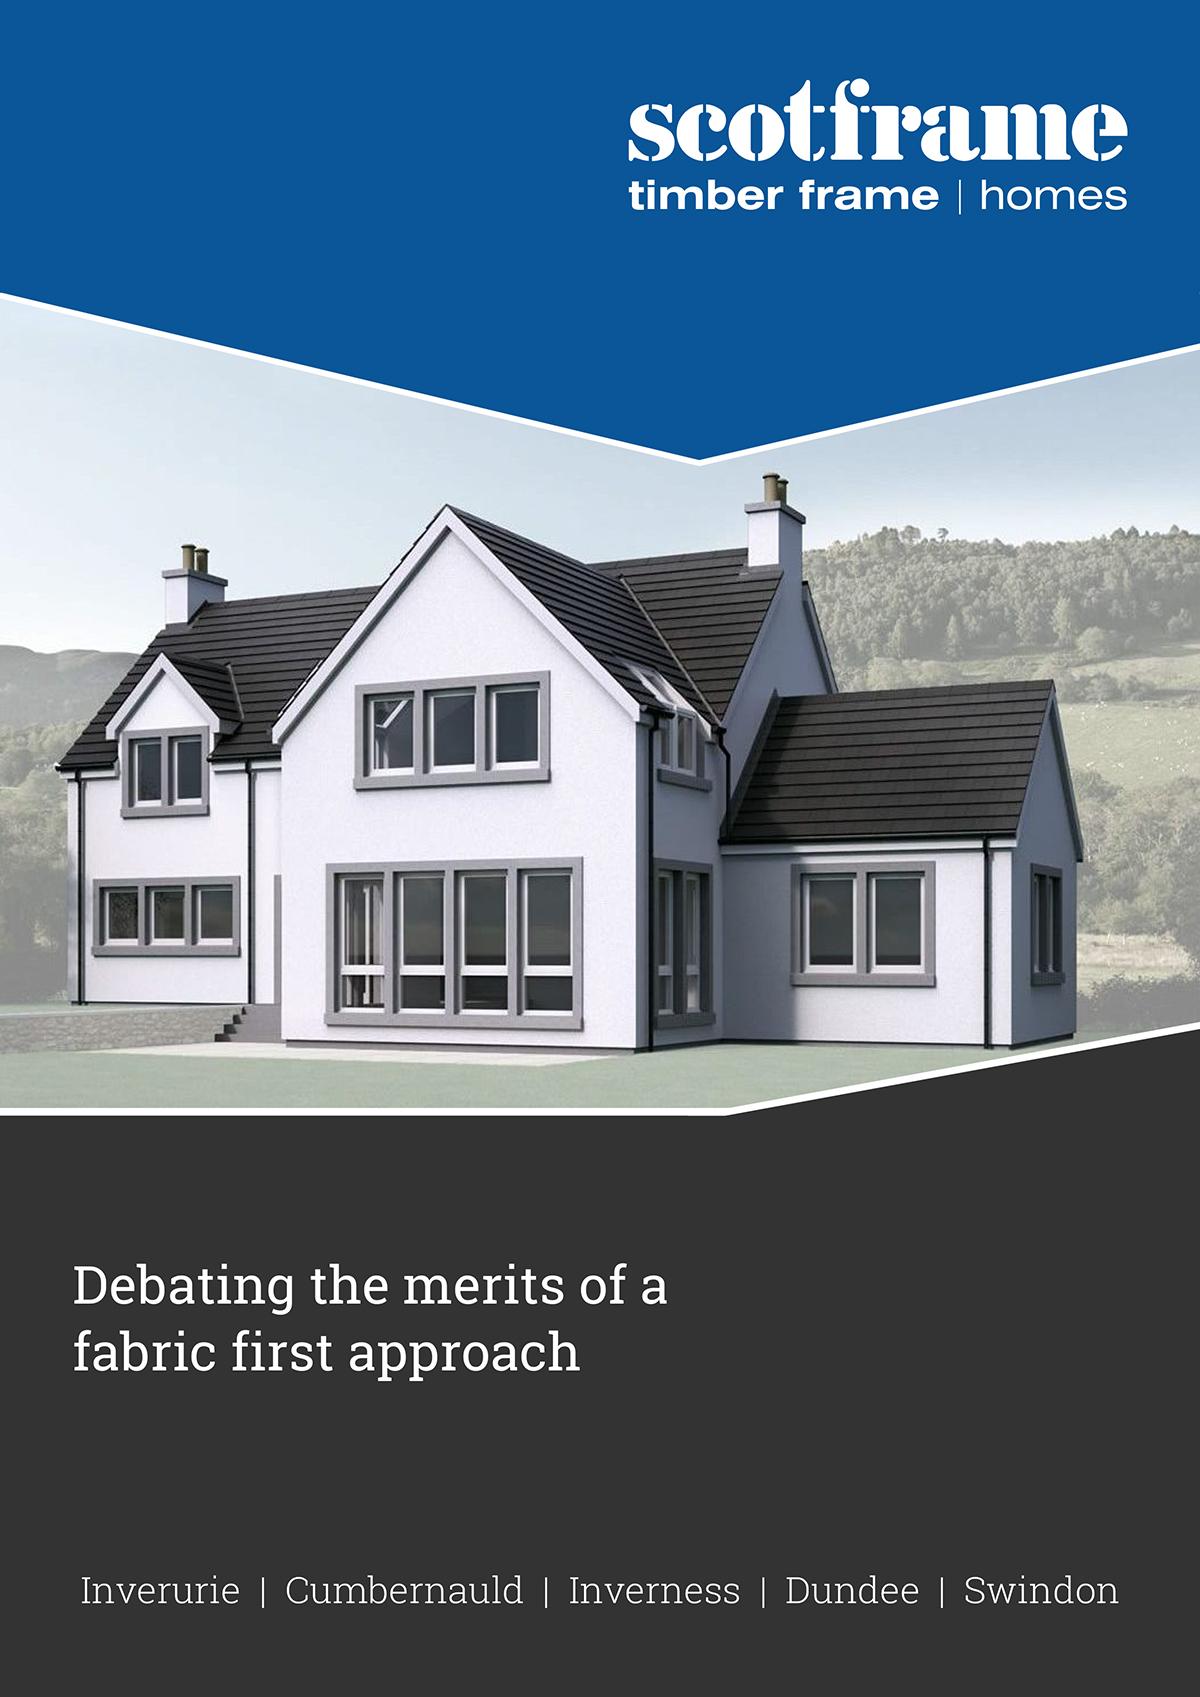 fabric first approach,